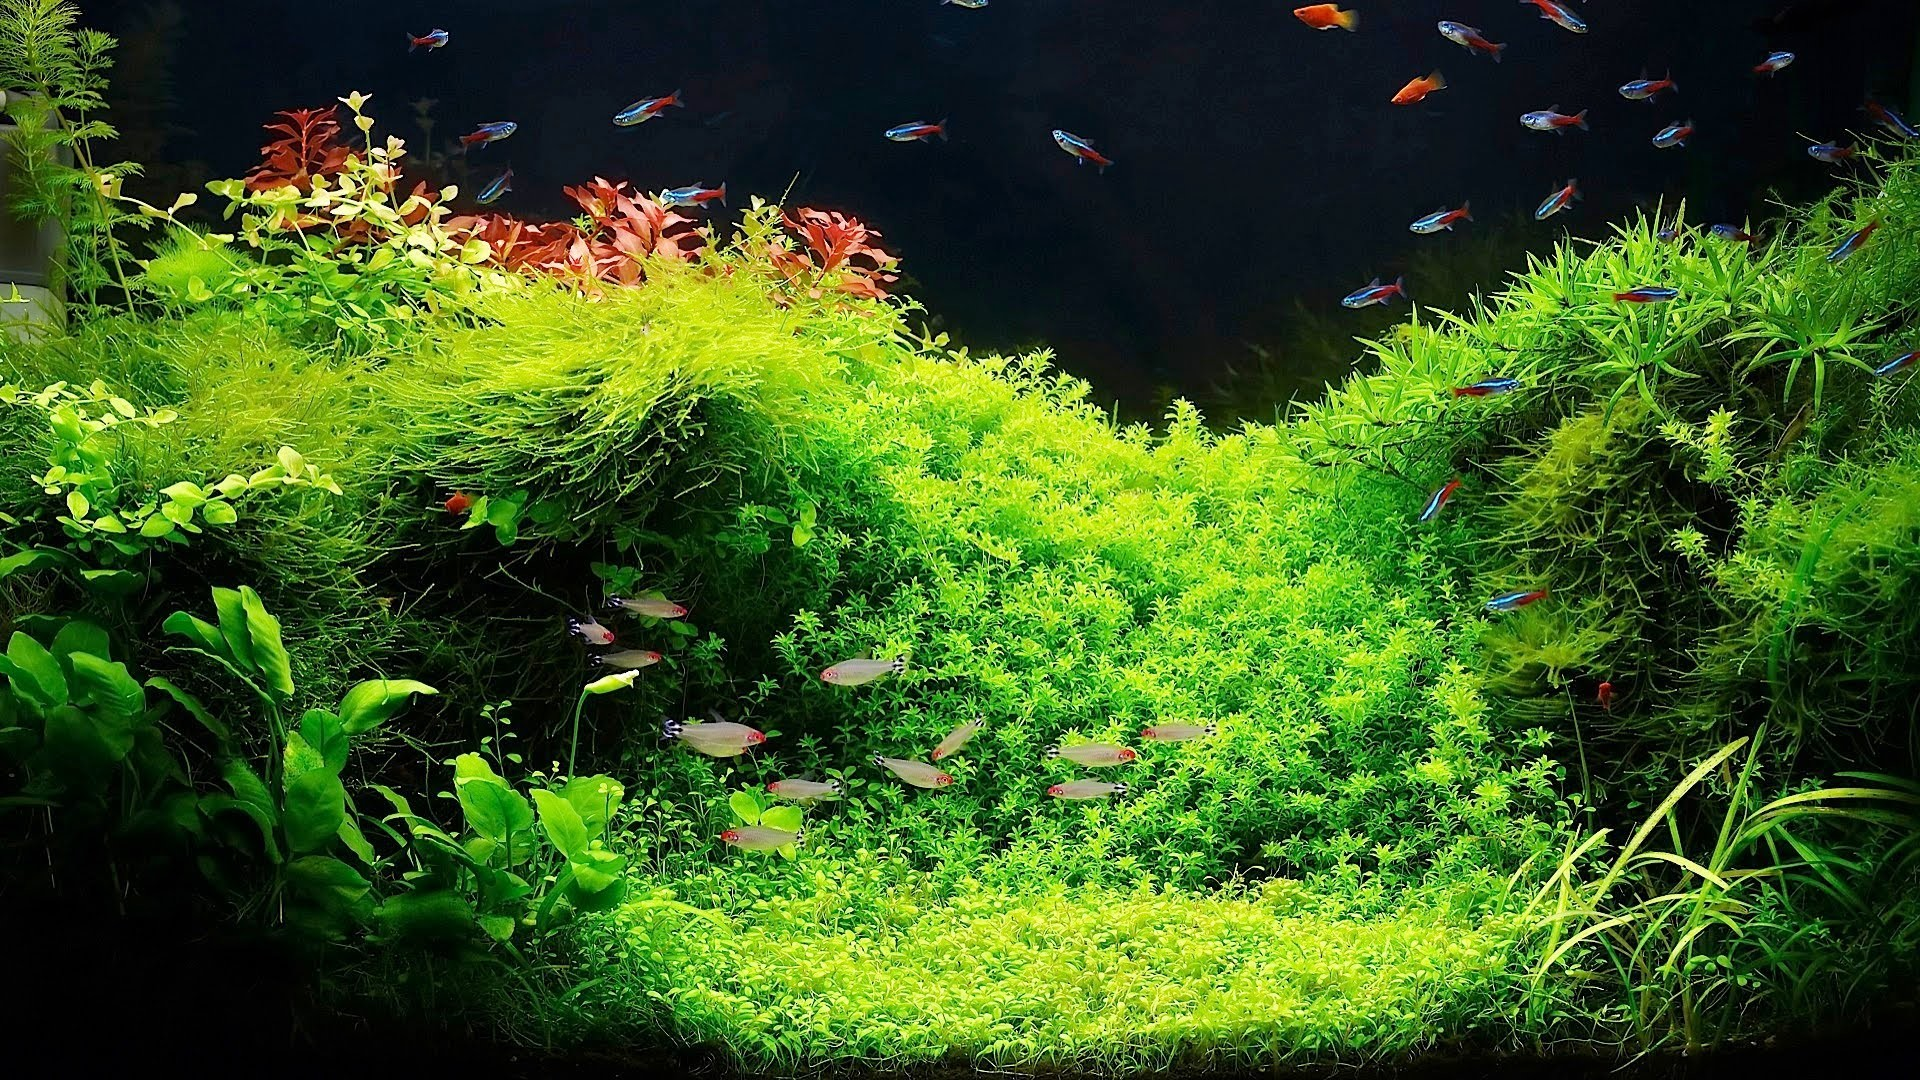 Full Size of Fish Tank Maxresdefault Singular Live Fish Aquarium Photos  Inspirations Freeware Screensaverolorful Plantslive Wallpaper …